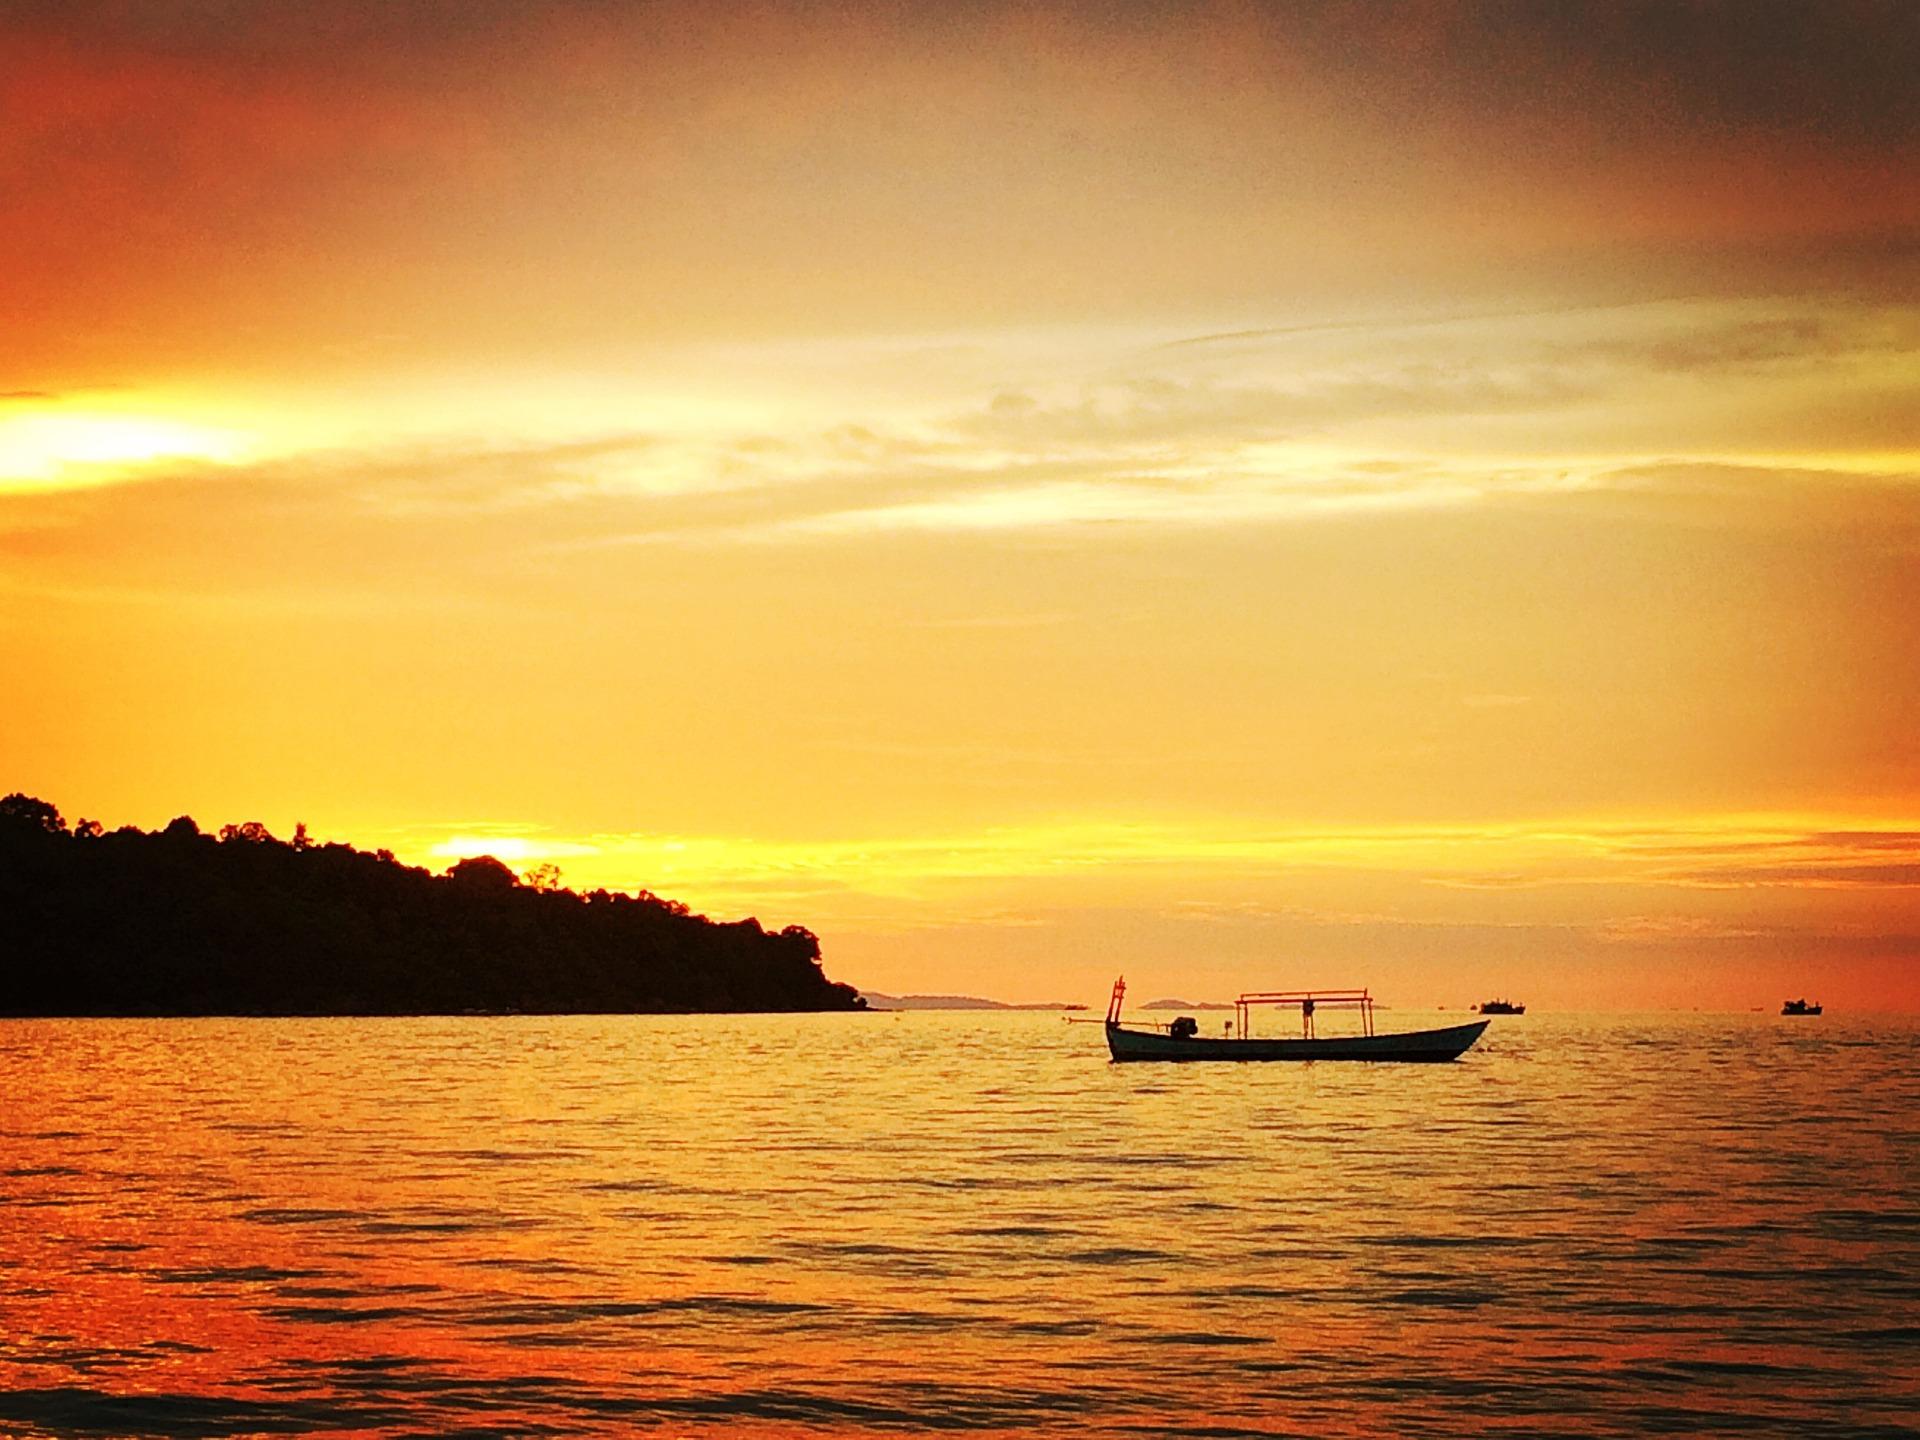 Cambodge - Phnom Penh, coucher de soleil (Pixabay)